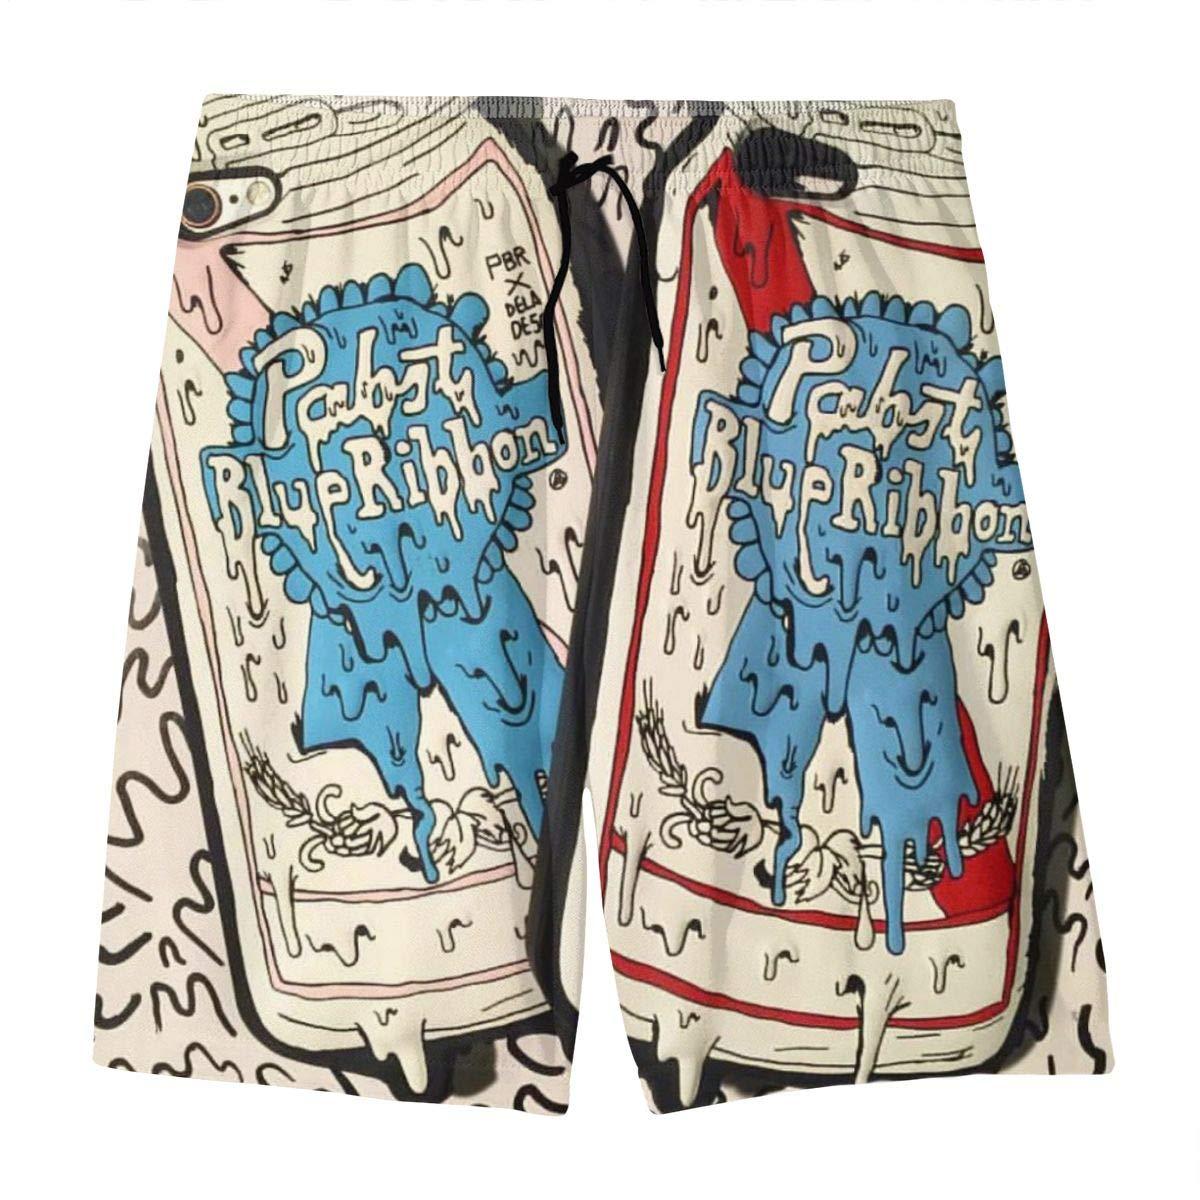 Pa-BST Blue Ribbon Teens Beach Board Shorts Quick Dry Bathing Suits Swim Trunks Shorts